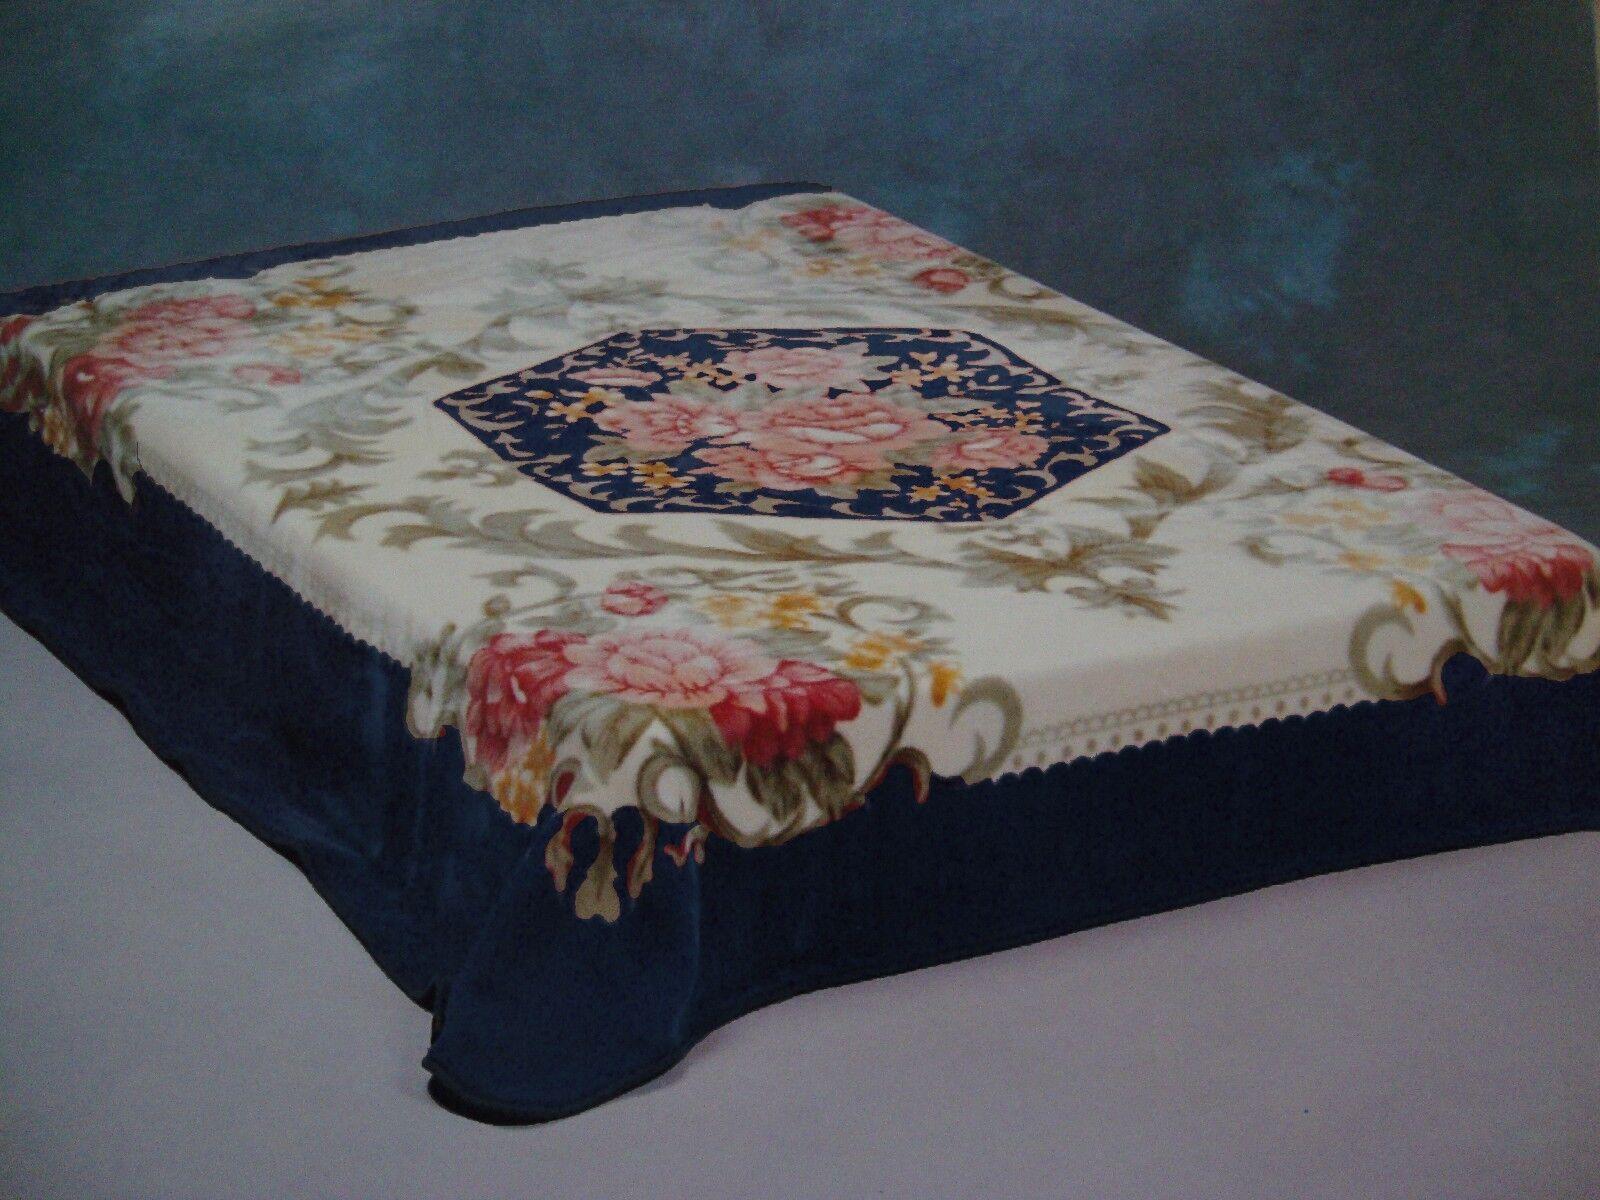 Korean Mink Blanket - Queen - Flower Design - Navy bluee - Premium Quality